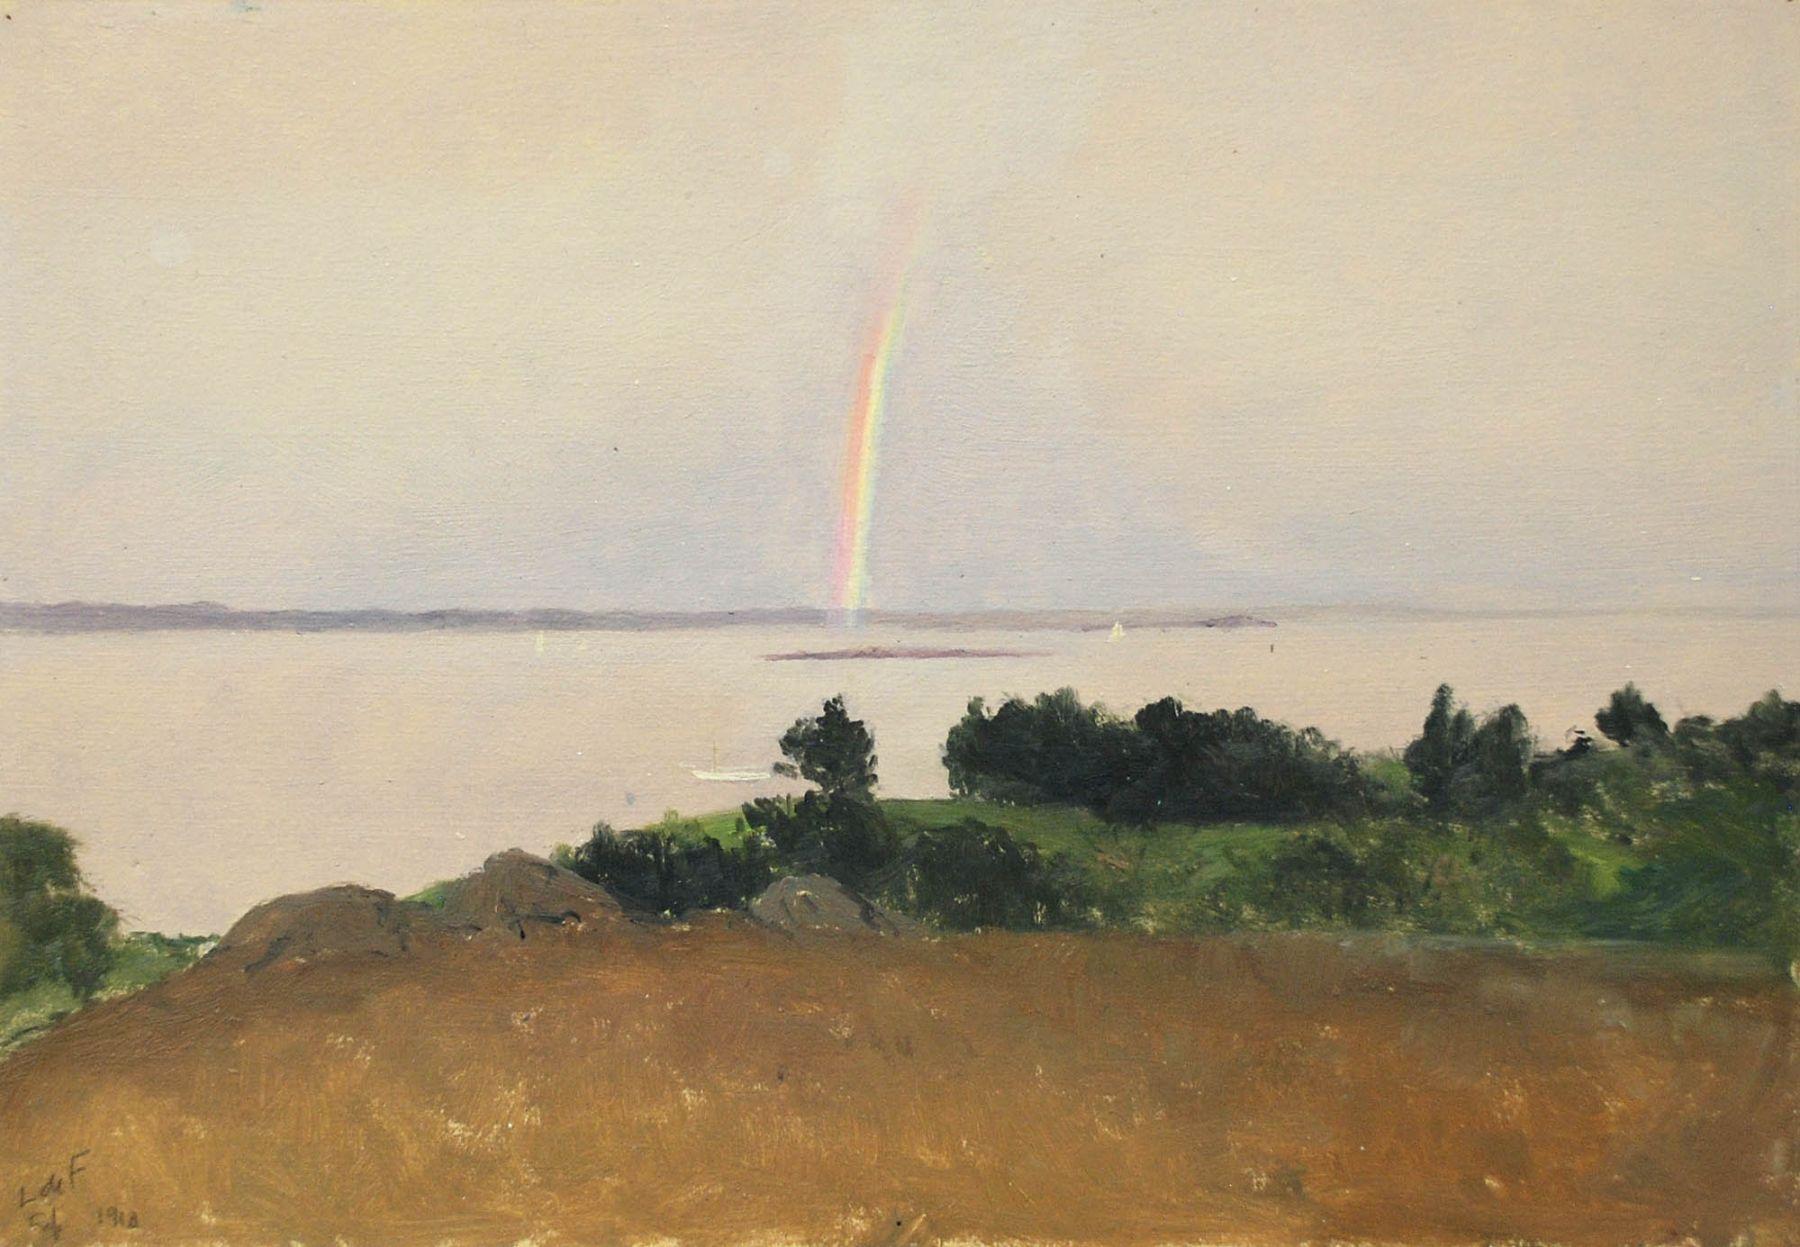 Lockwood De Forest, Carmel Bay Pebble Beach Overlook, with Rainbow and Sailboats (Monterey), September 1910